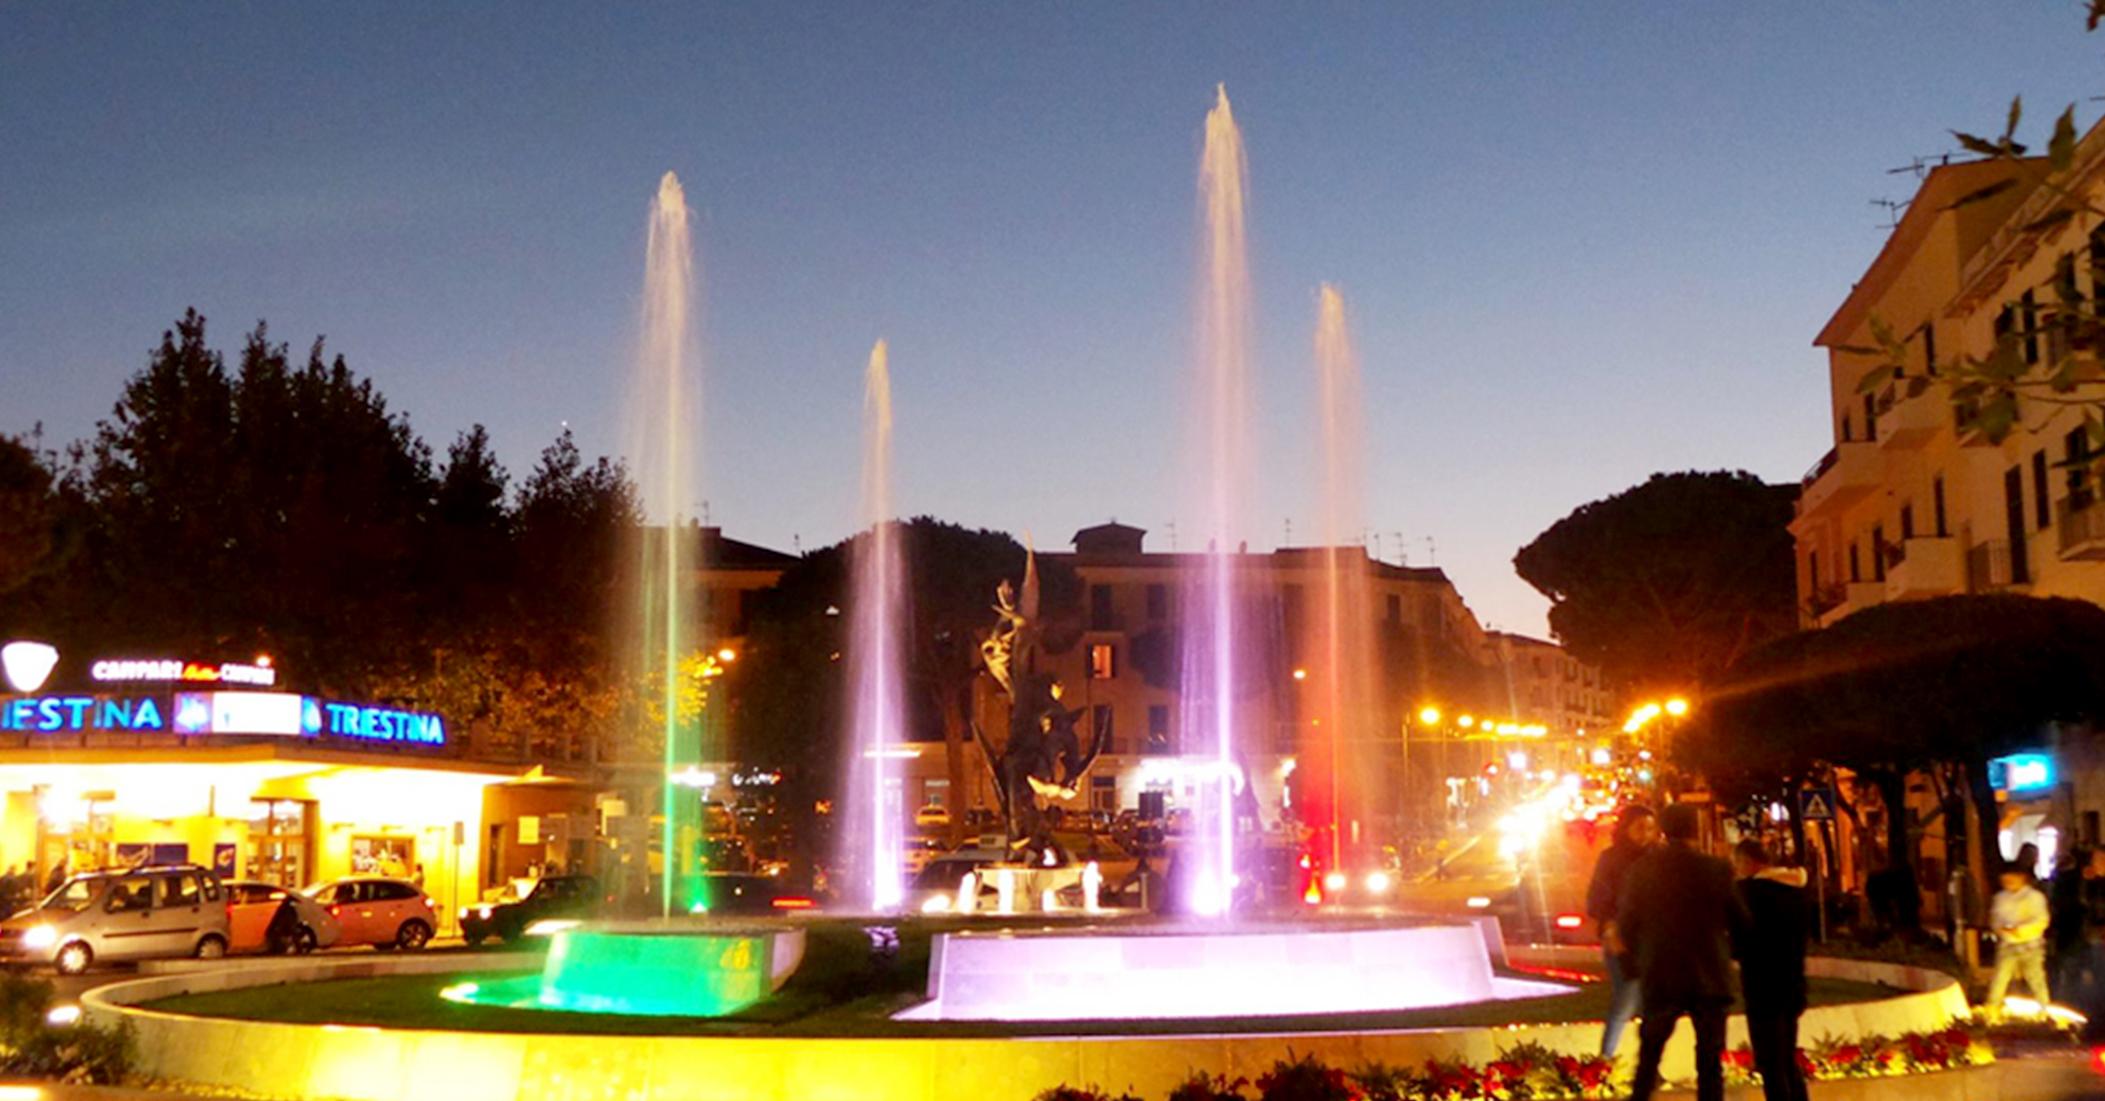 9_fontana_monumentale_gaeta_architetto_davide_di_cola_ldcarchitettura_891x466